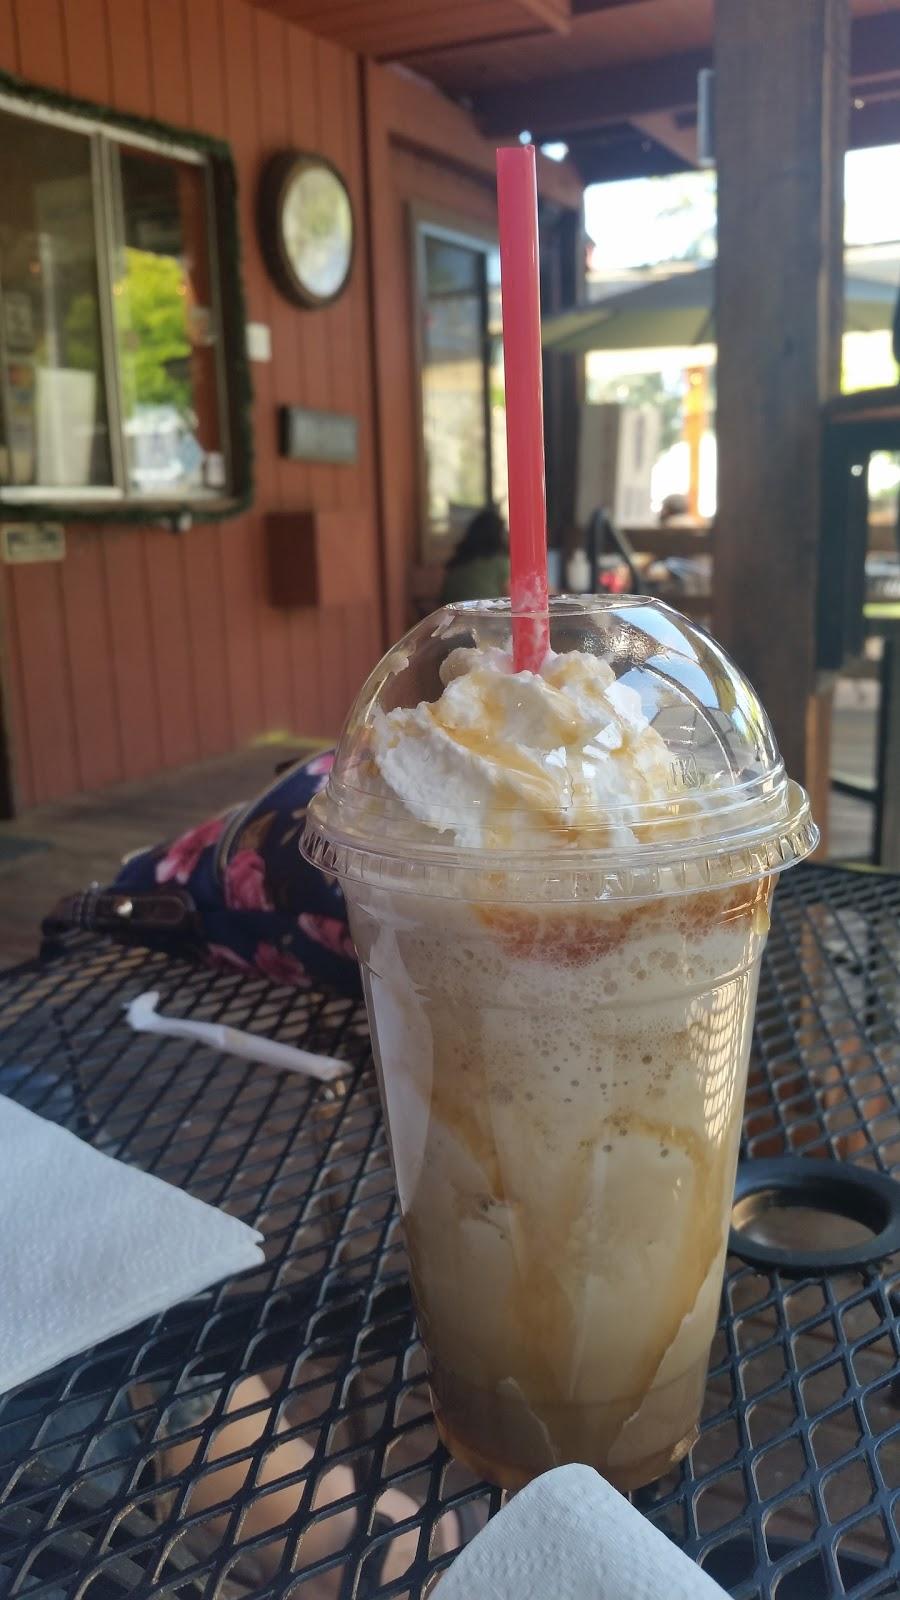 Village Grind - cafe    Photo 5 of 10   Address: 6020 Park Dr, Wrightwood, CA 92397, USA   Phone: (760) 249-5501